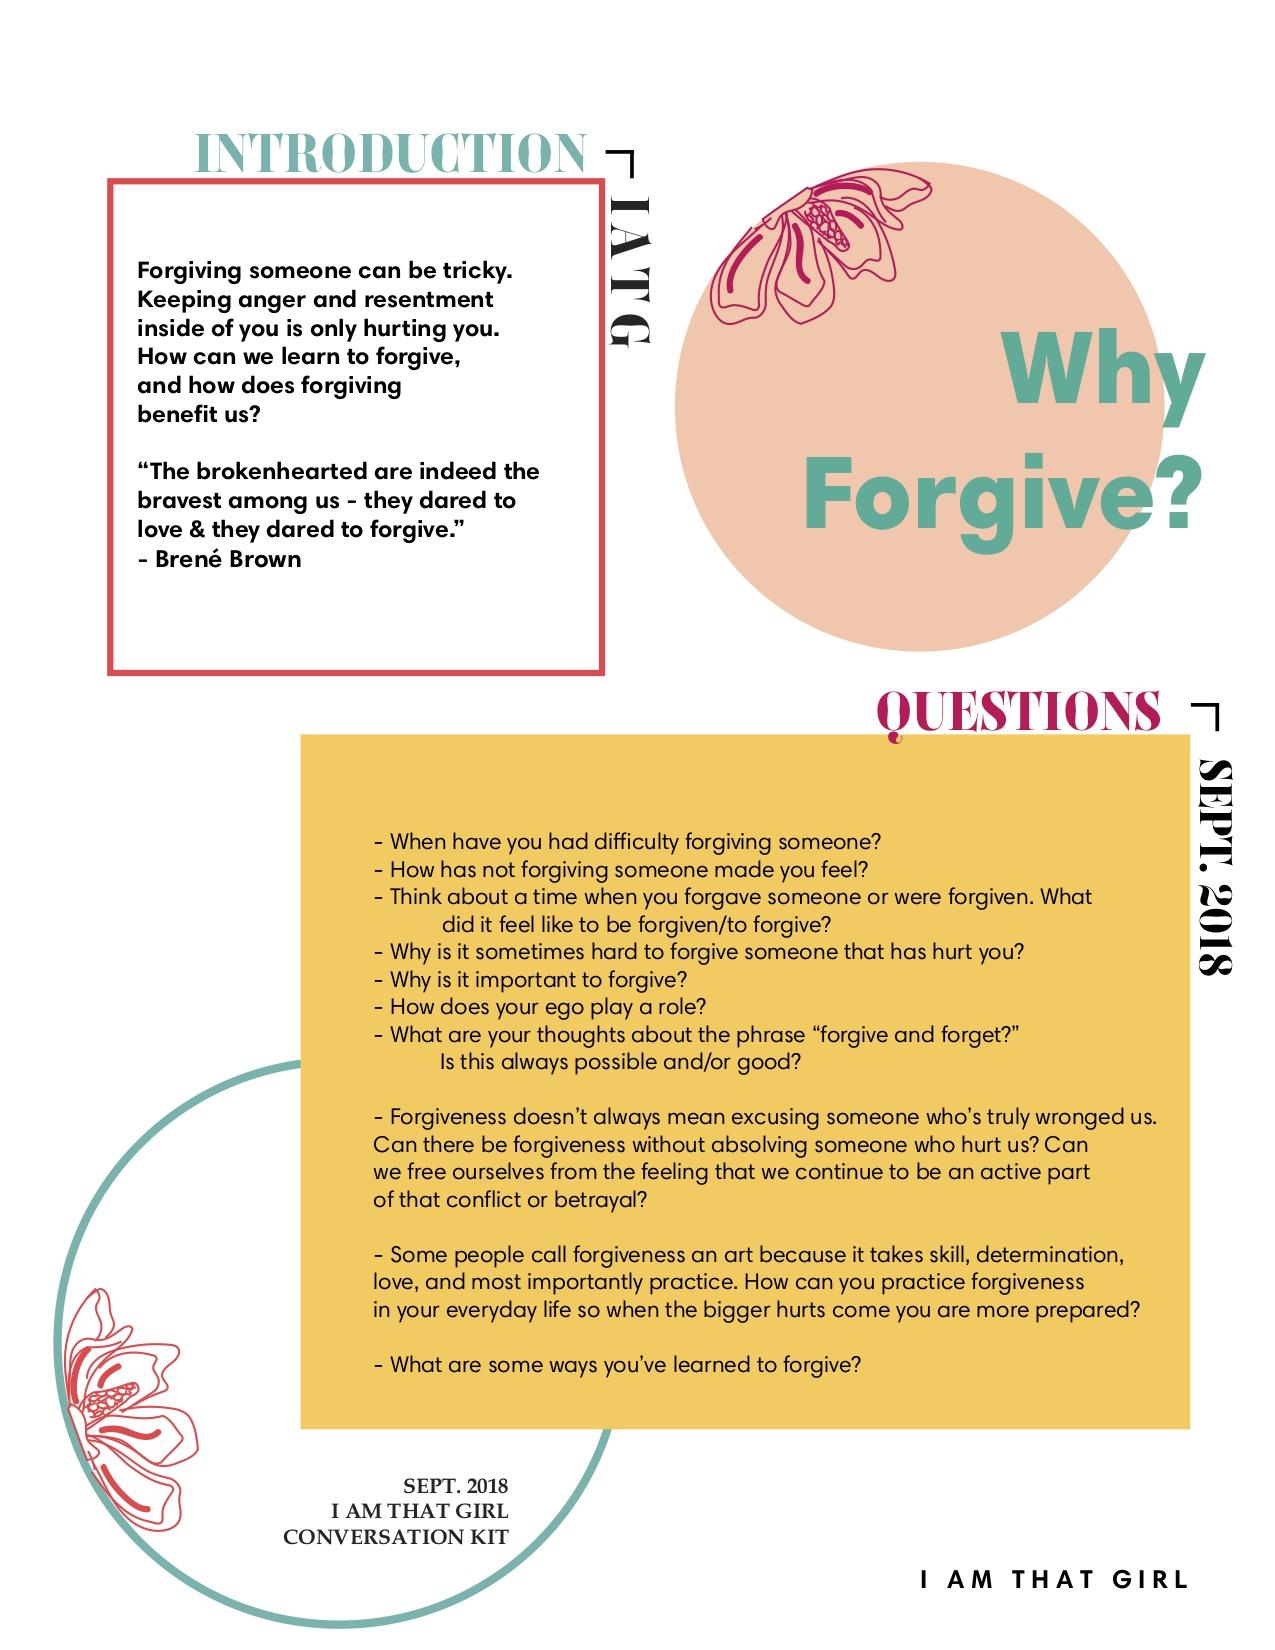 WHY_FORGIVE_IATG_CONVERSATION_KIT.jpg